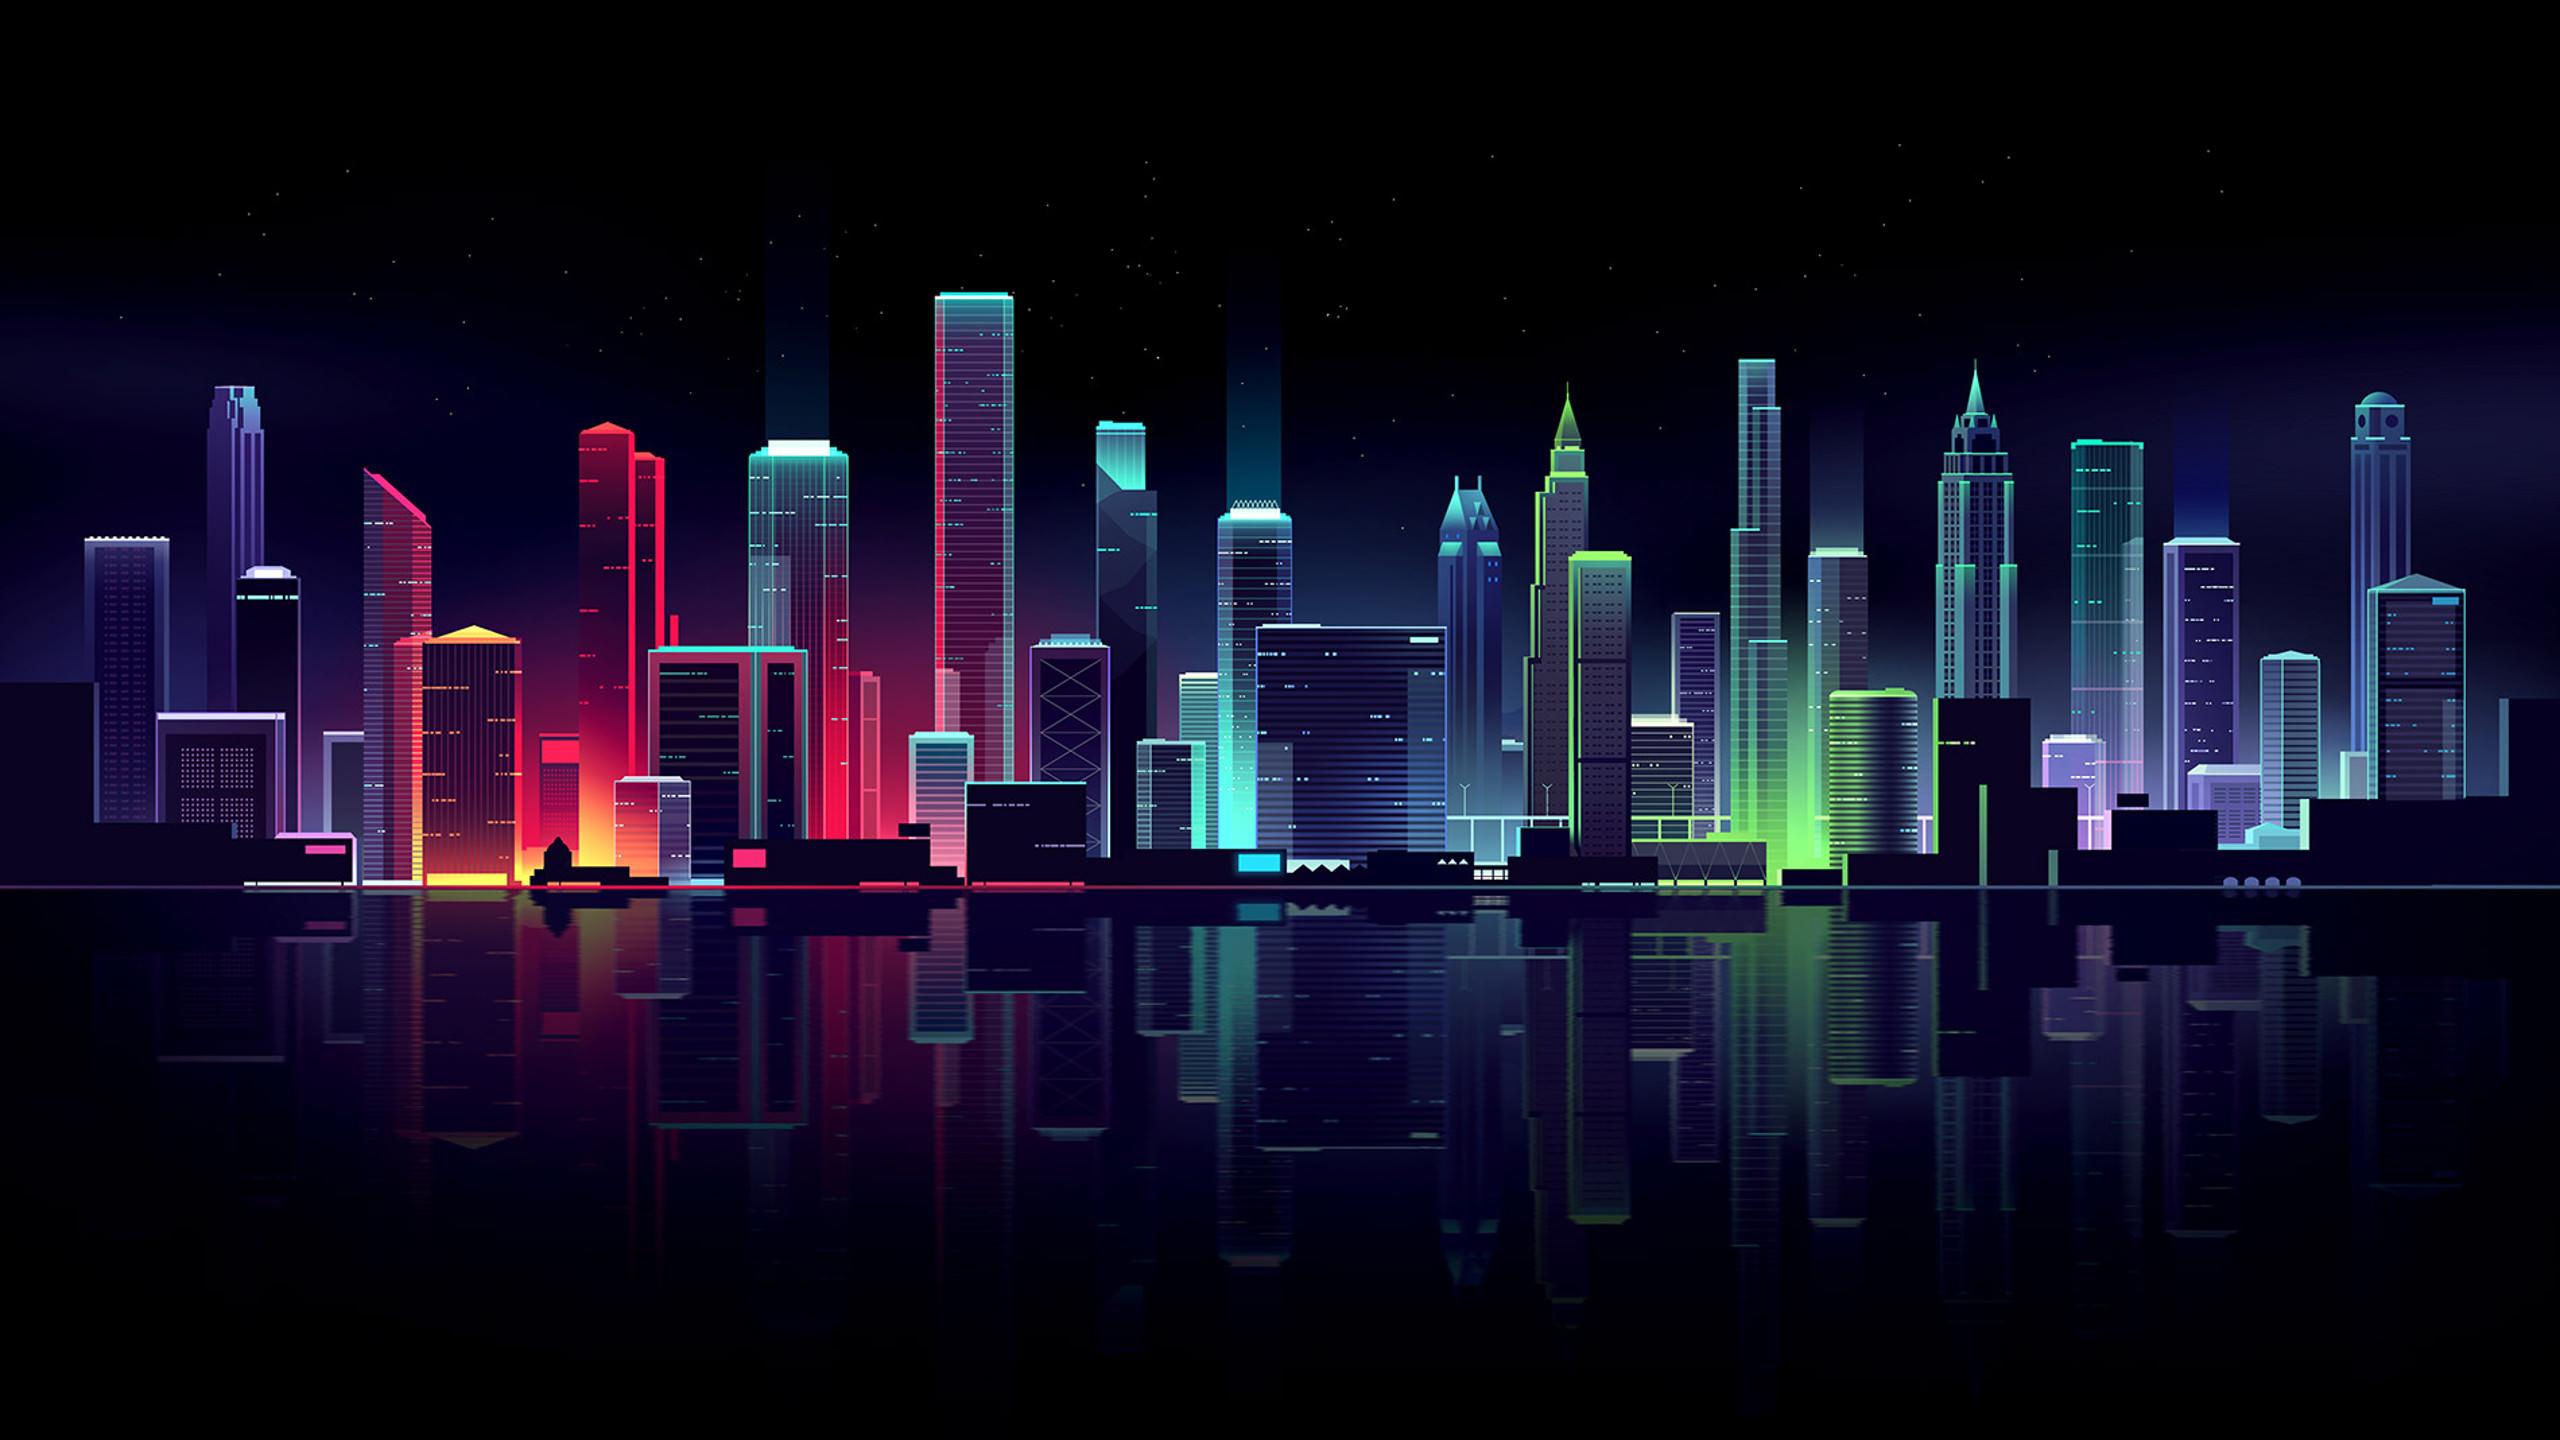 General 2560x1440 building lights illustration Romain Trystram cityscape skyline colorful reflection digital art neon lights futuristic city neon dark night